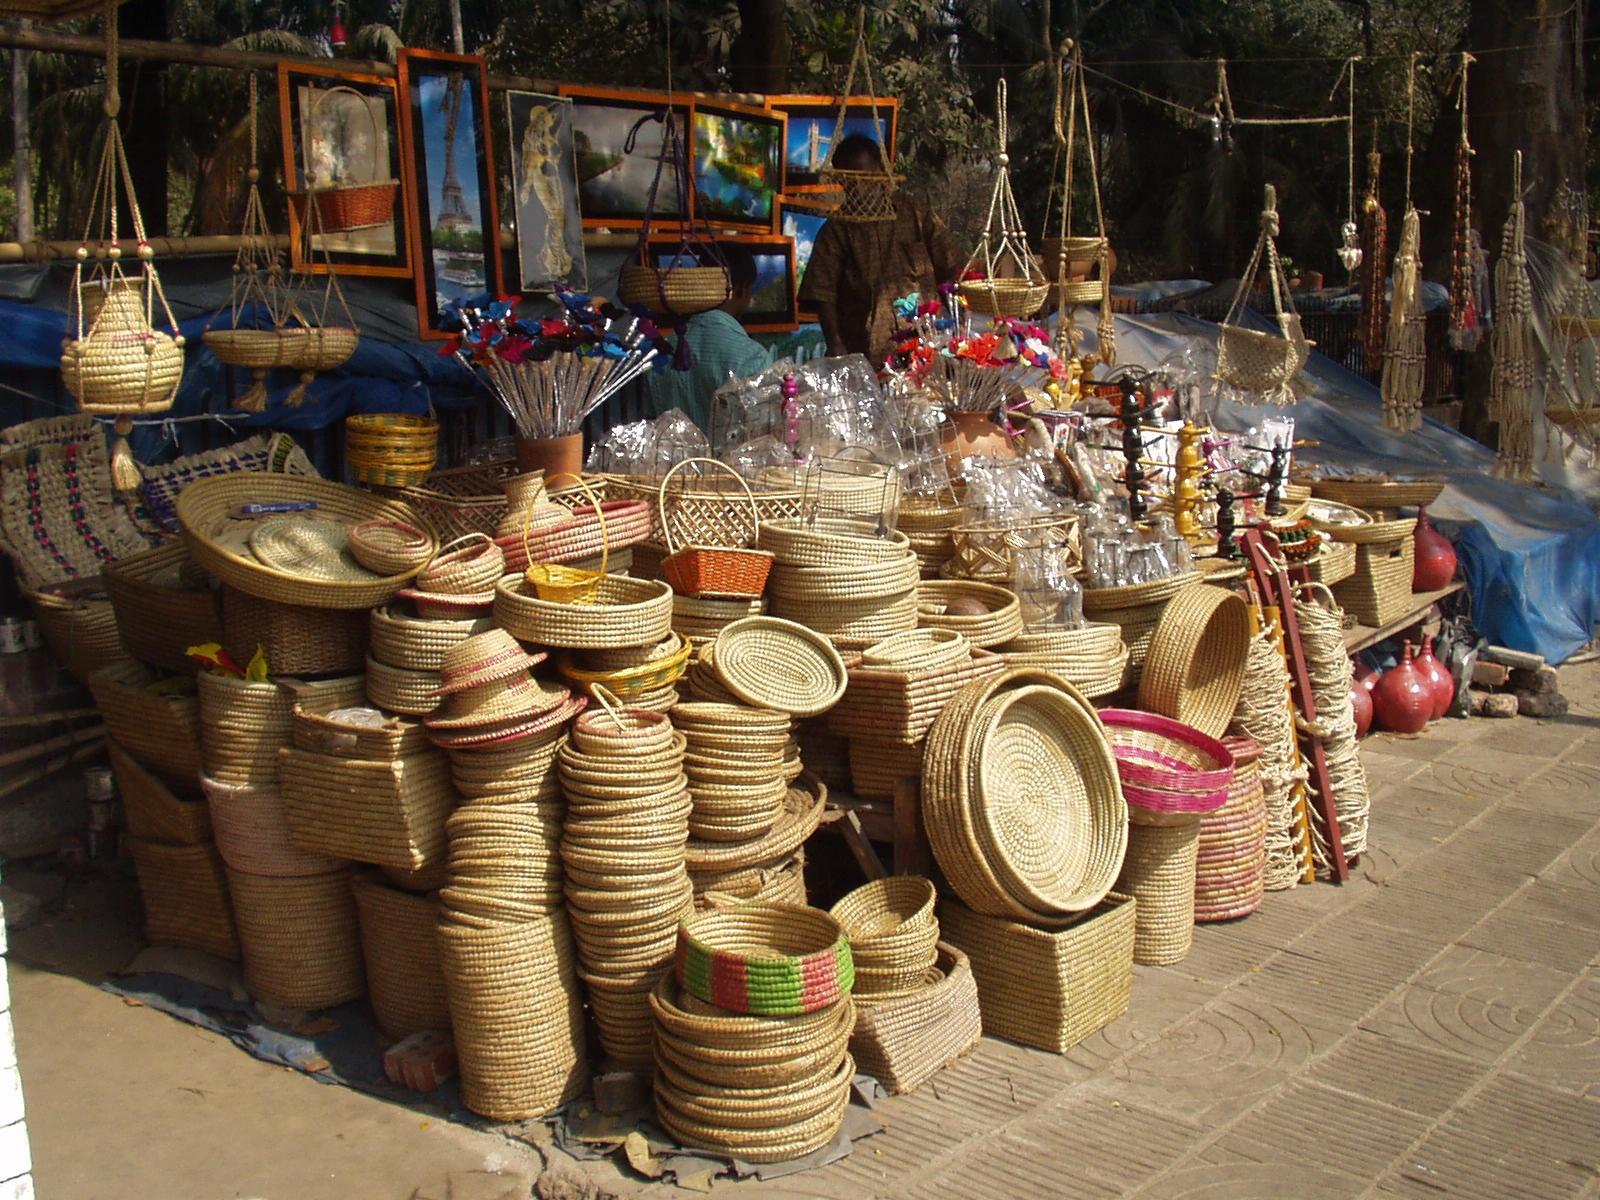 rani no haziro market-handicraft items shopping in ahmedabad